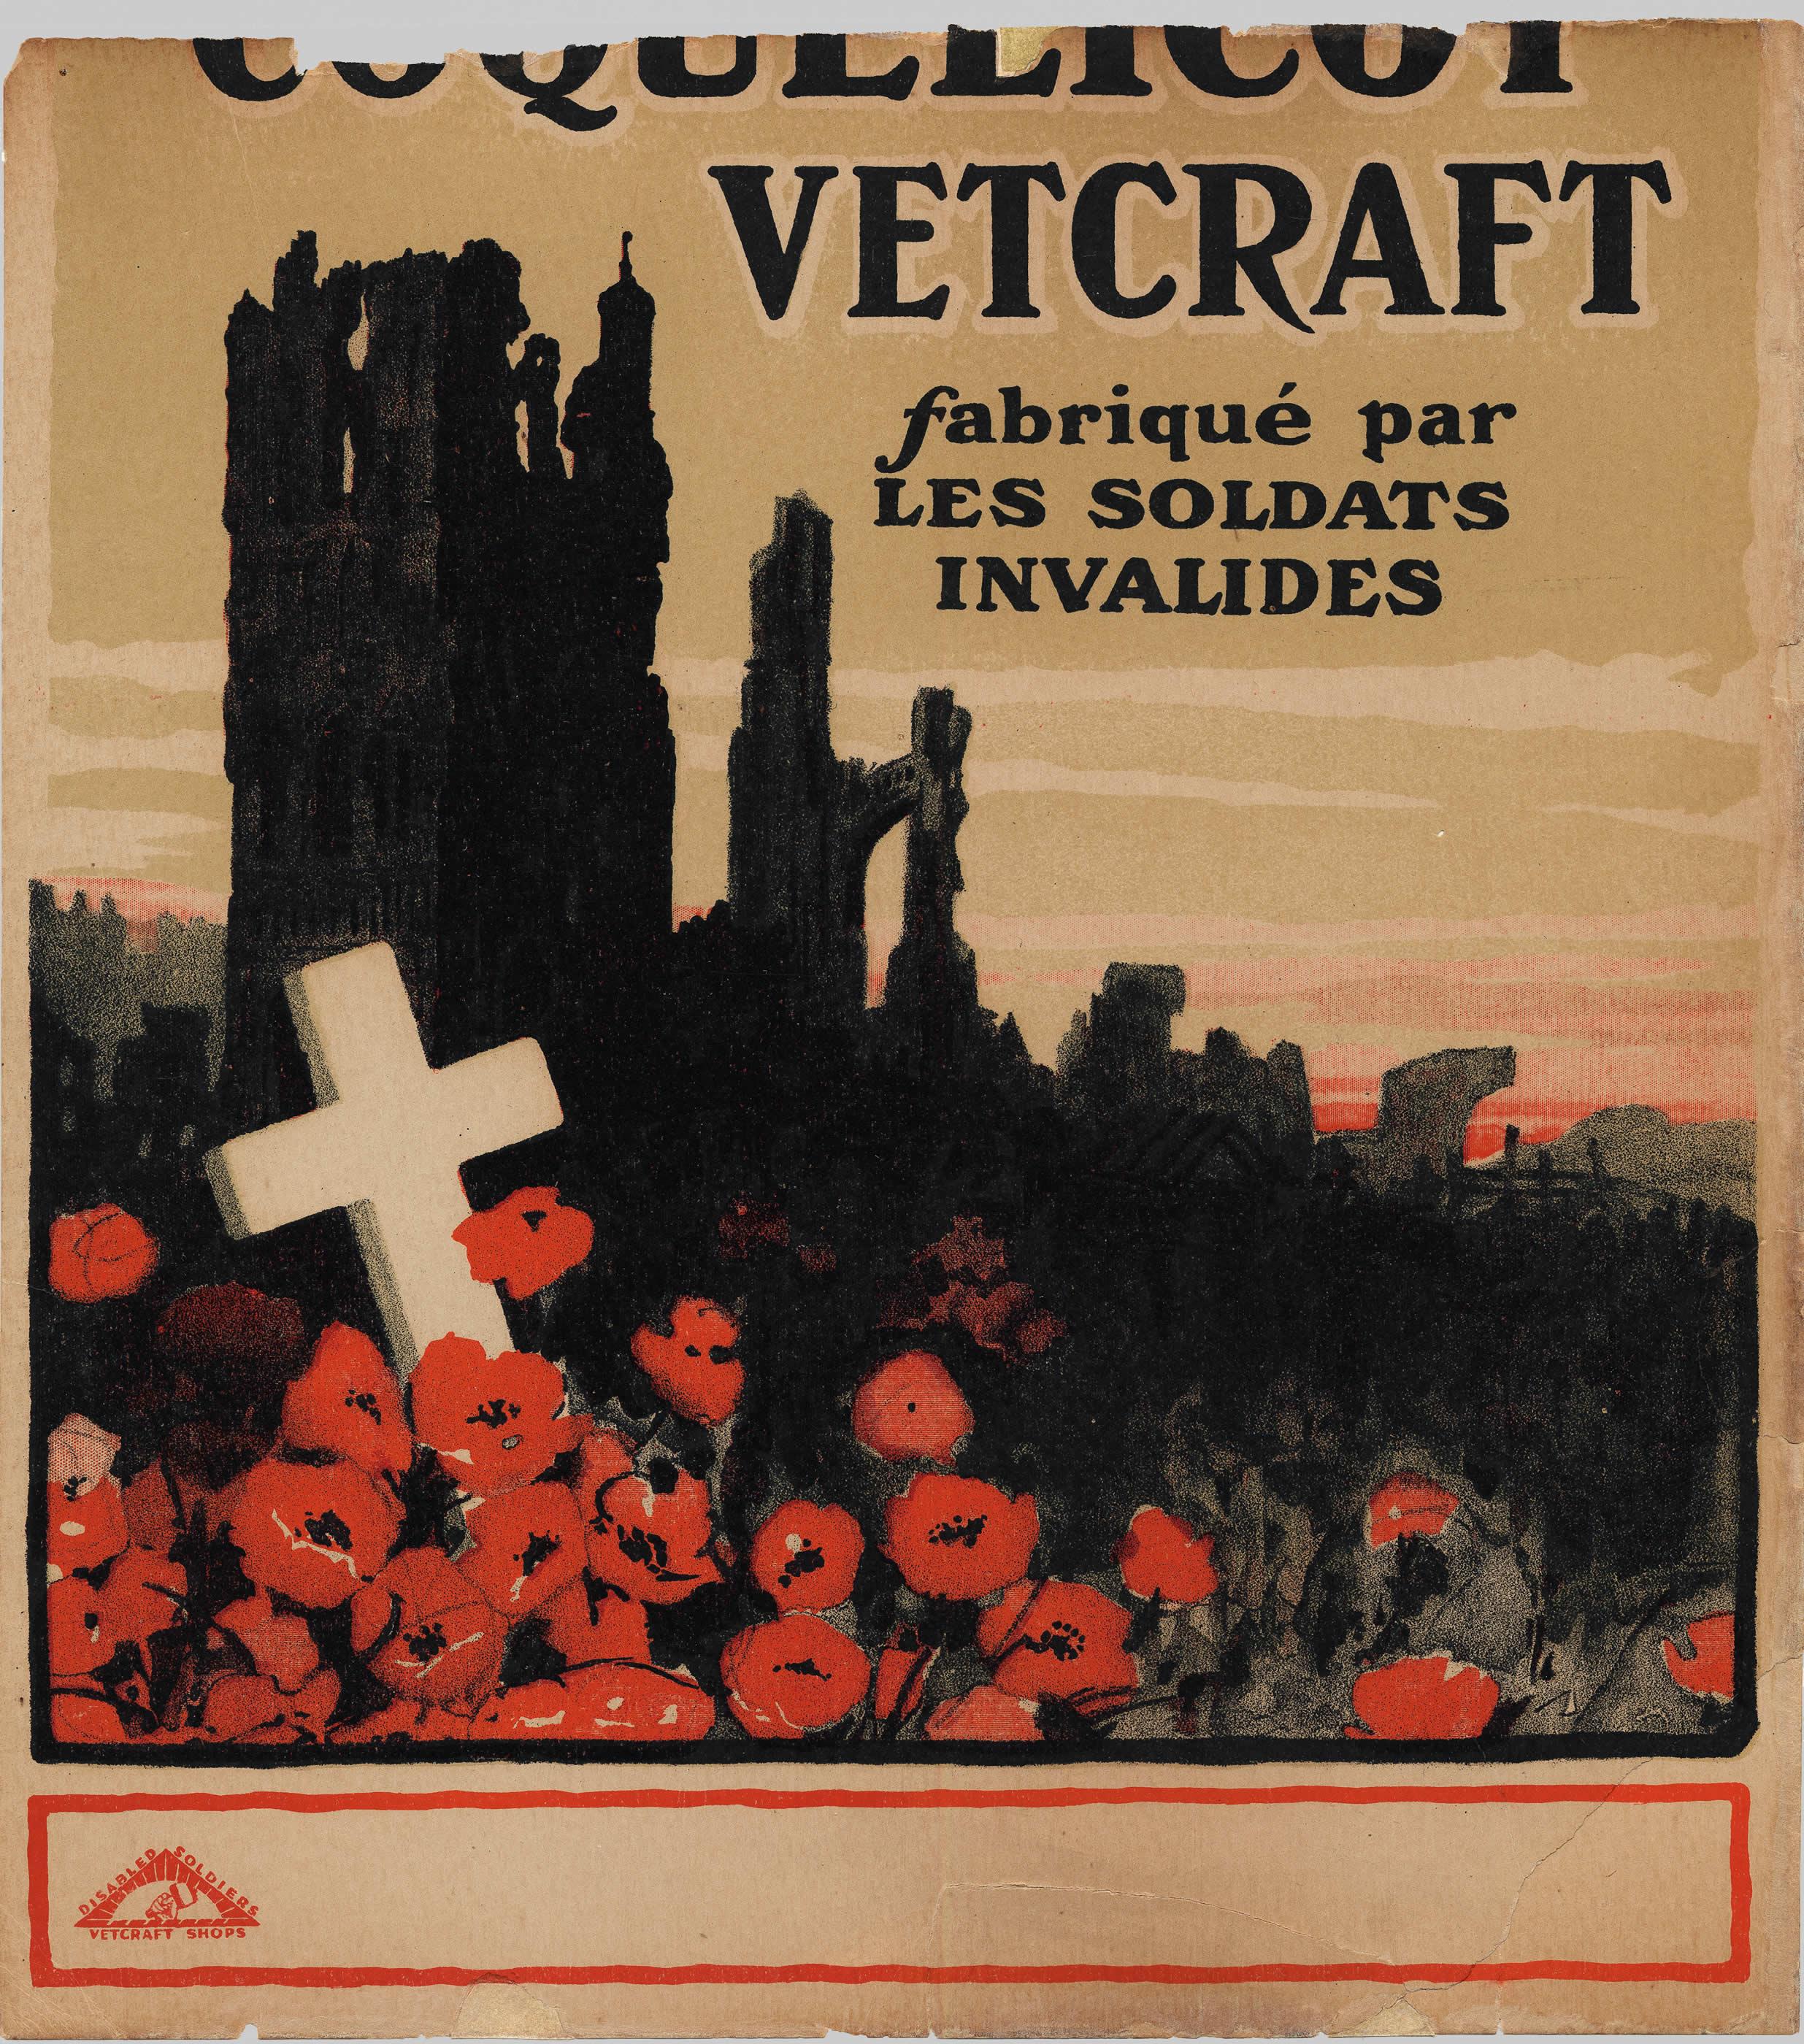 Coquelicot Vetcraft (Vetcraft Poppy)